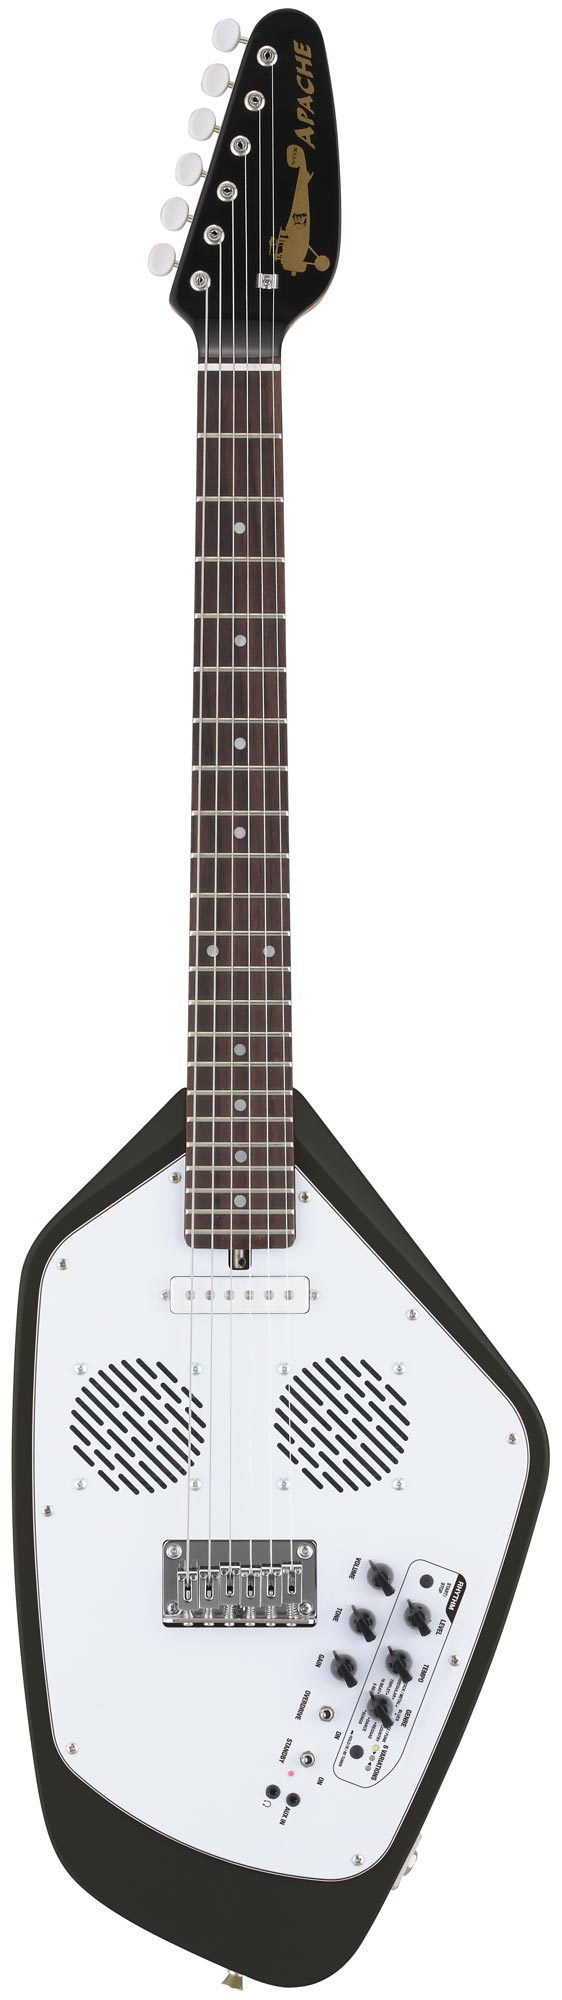 Vox Apache Ii Guitar Cool Guitar Guitar Tech